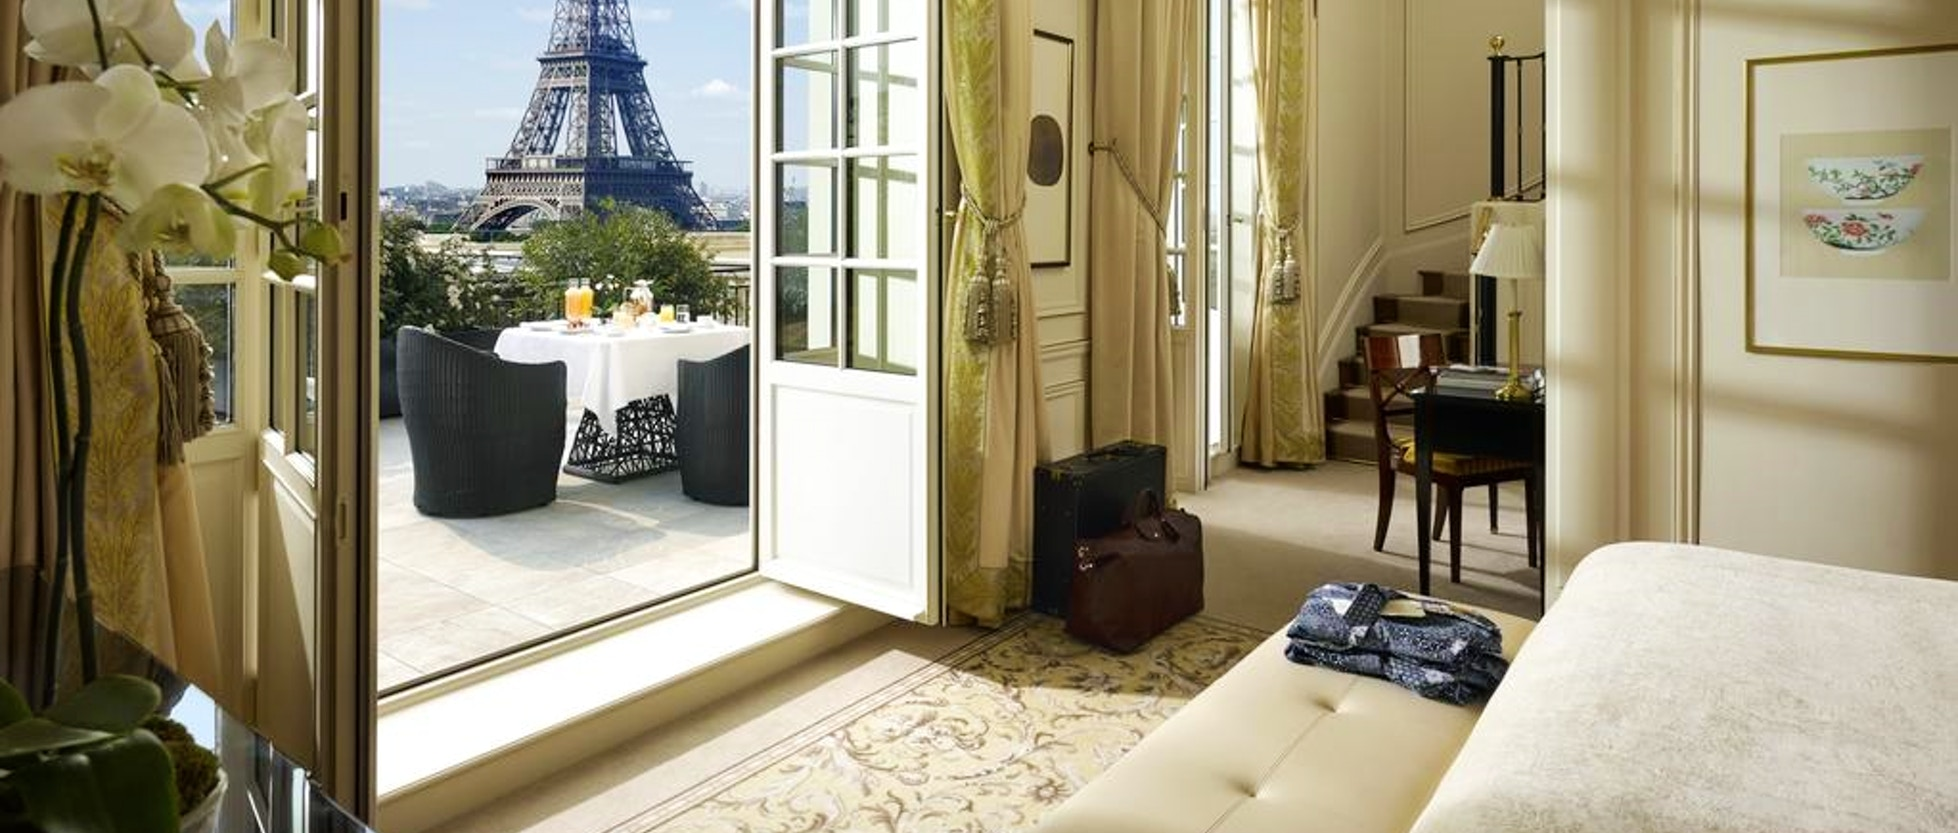 9 hotel ideali per un romantico weekend a parigi vivi parigi for Colazione parigi